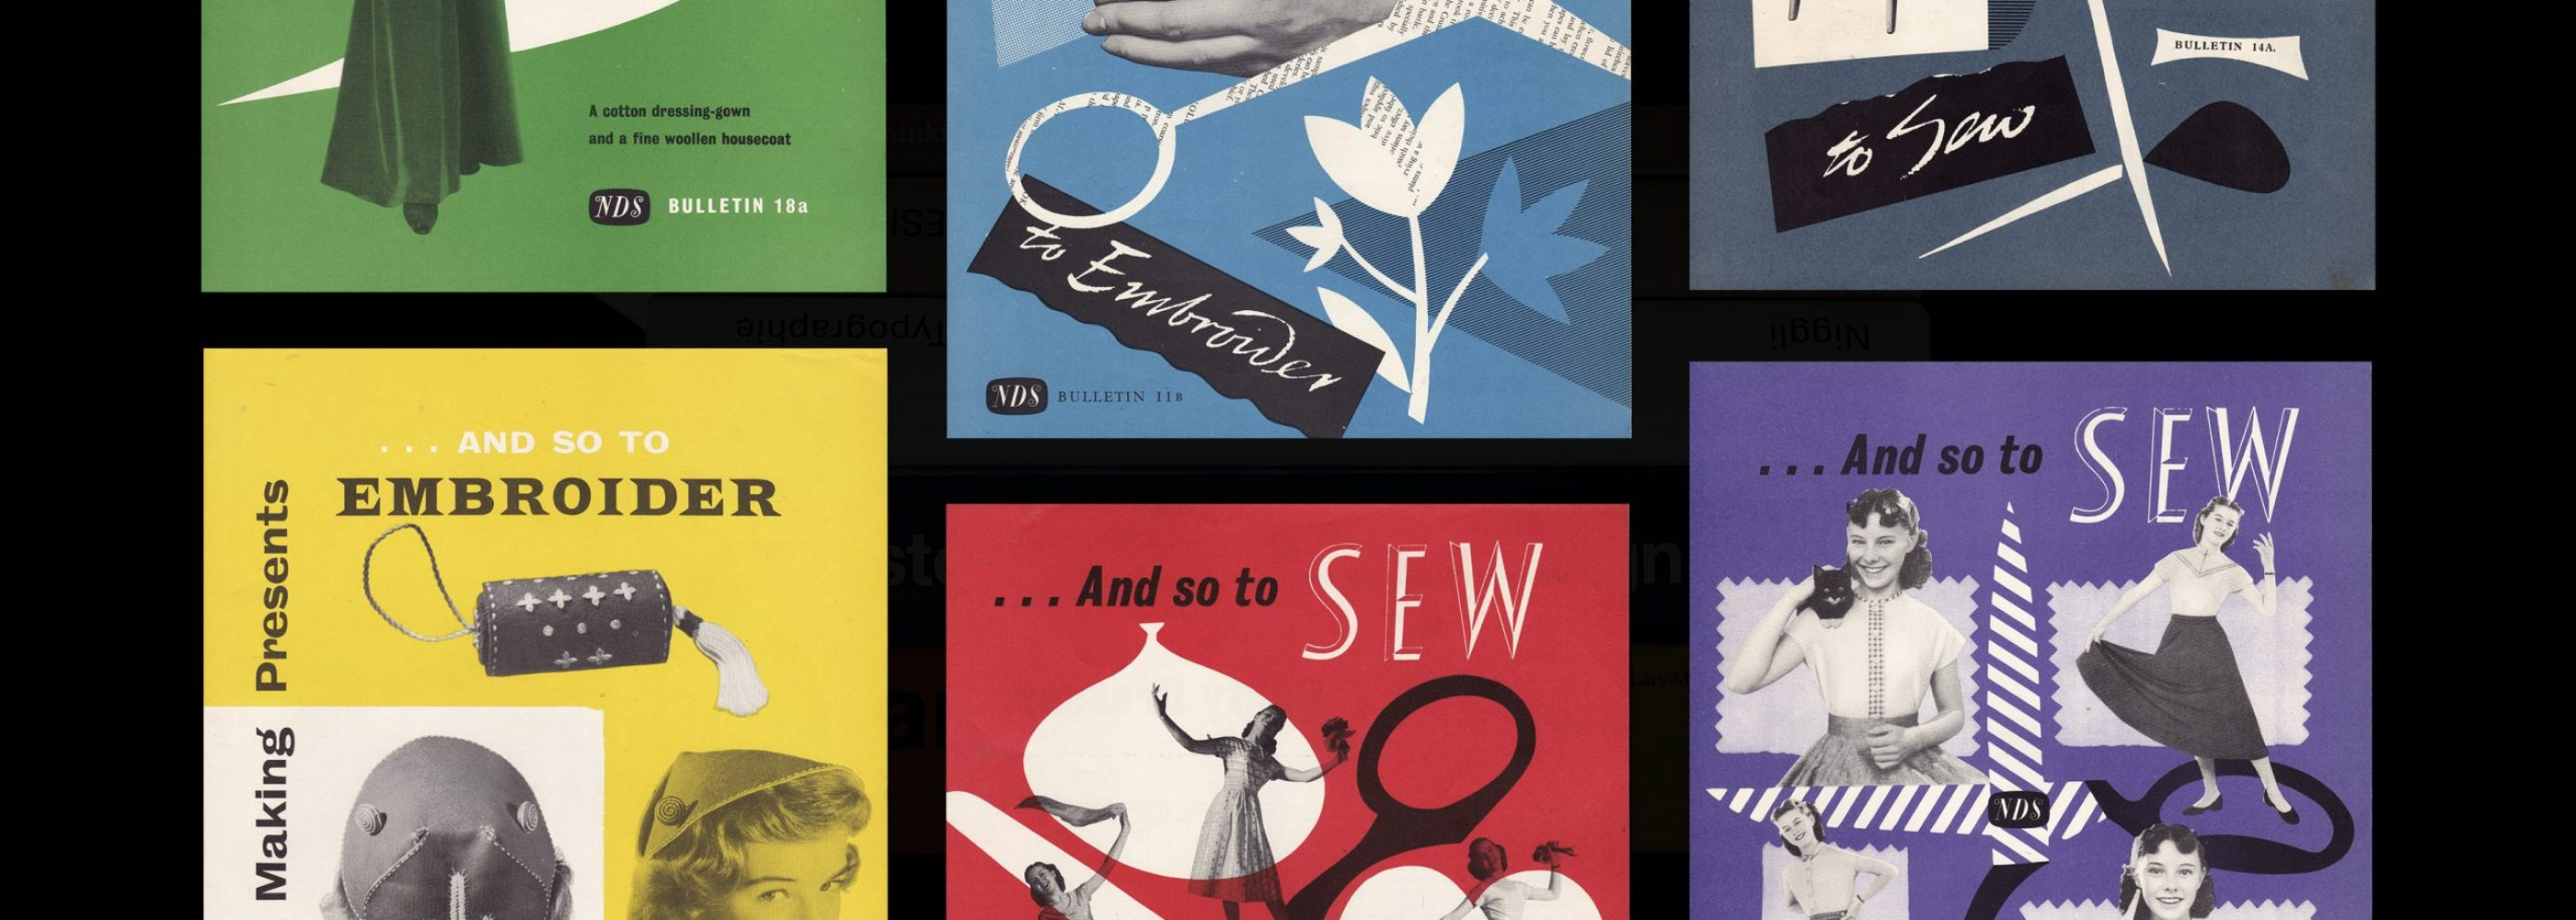 and-so-to-the-Needlework-Development-Scheme